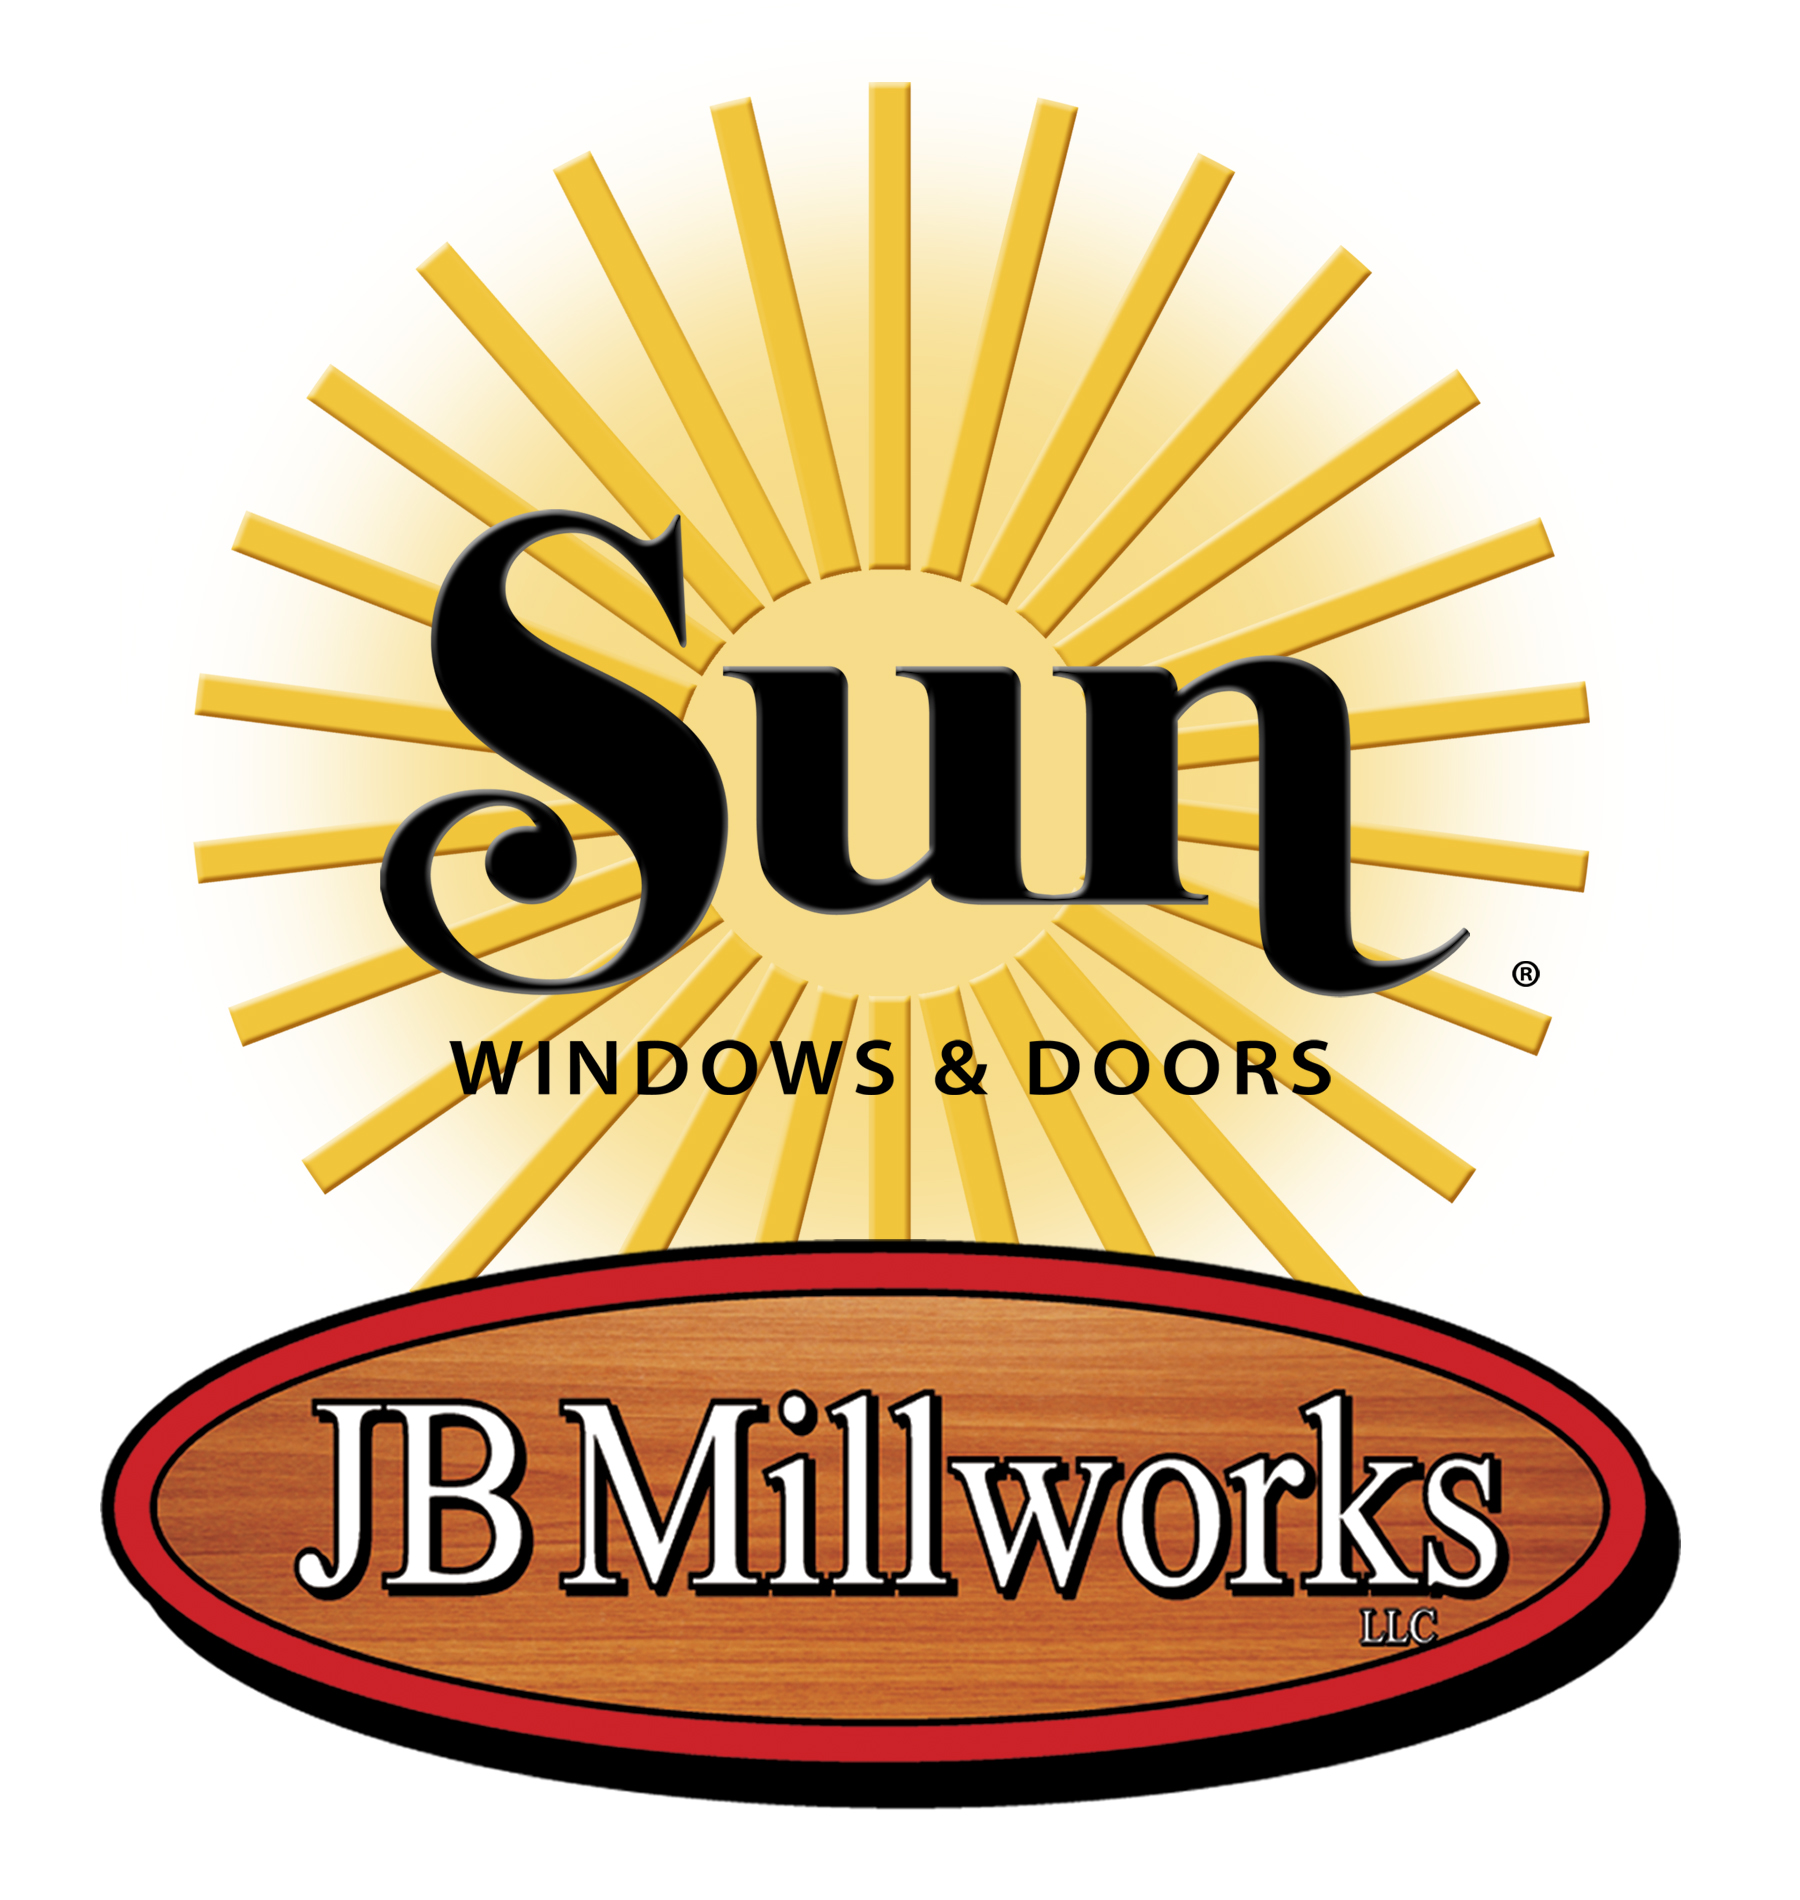 Sun_JBMillworks_logo_v2.jpg